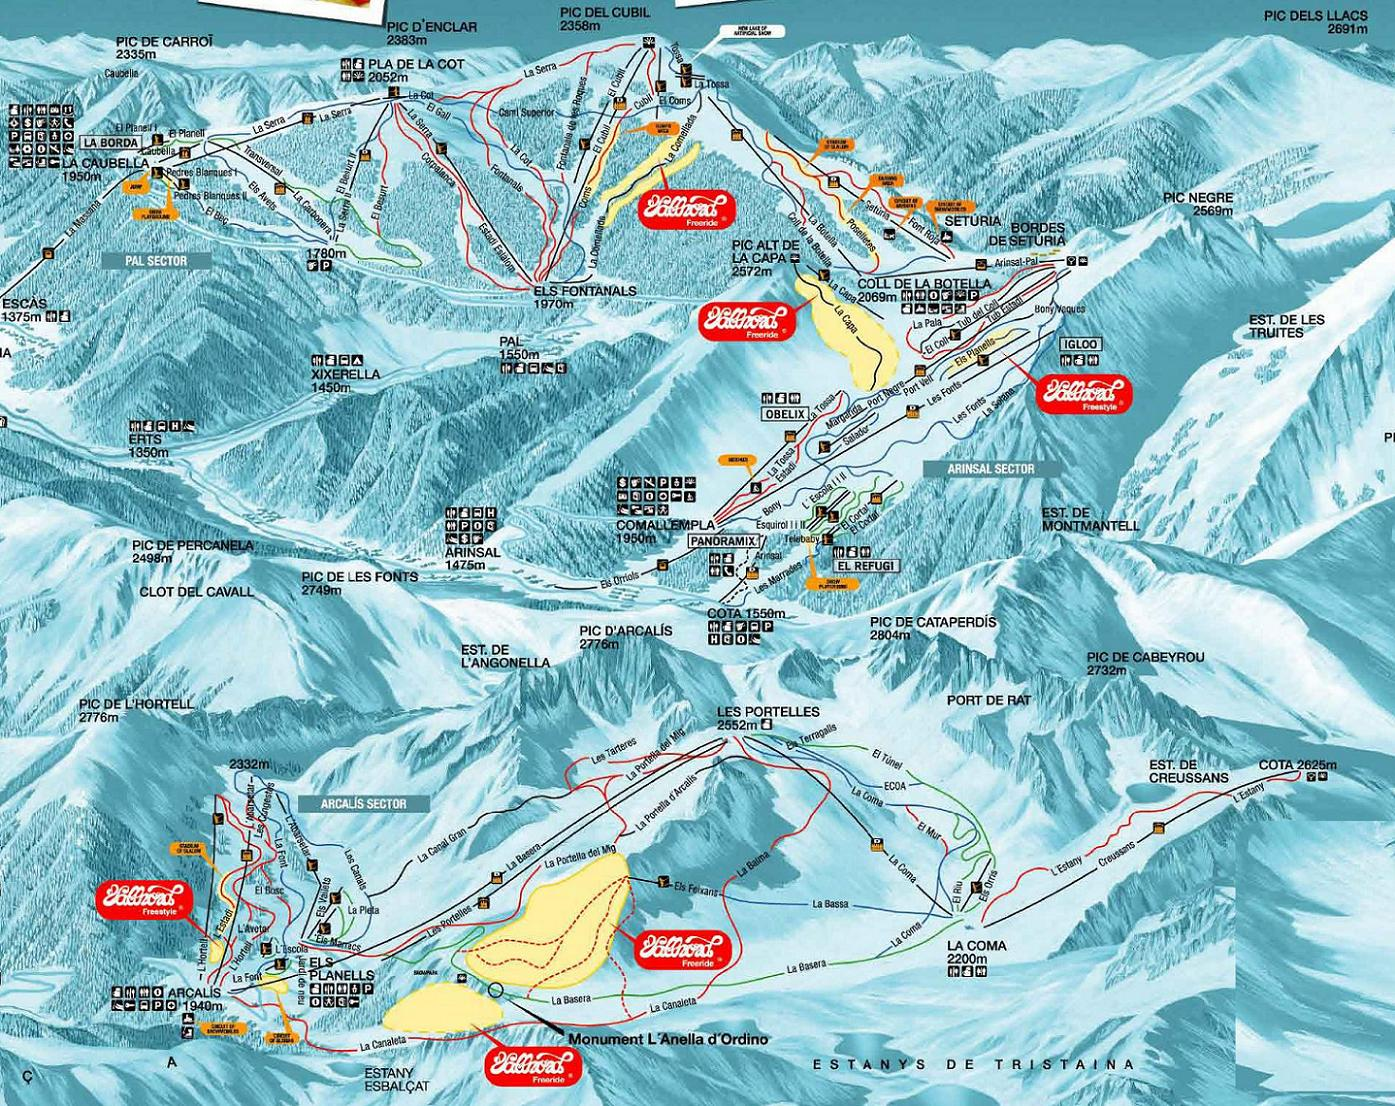 andorra ski resorts map with Piste Map Pal Ski Maps on Zermatt besides Solden in addition Schladming furthermore Ski Map in addition El Tarter.